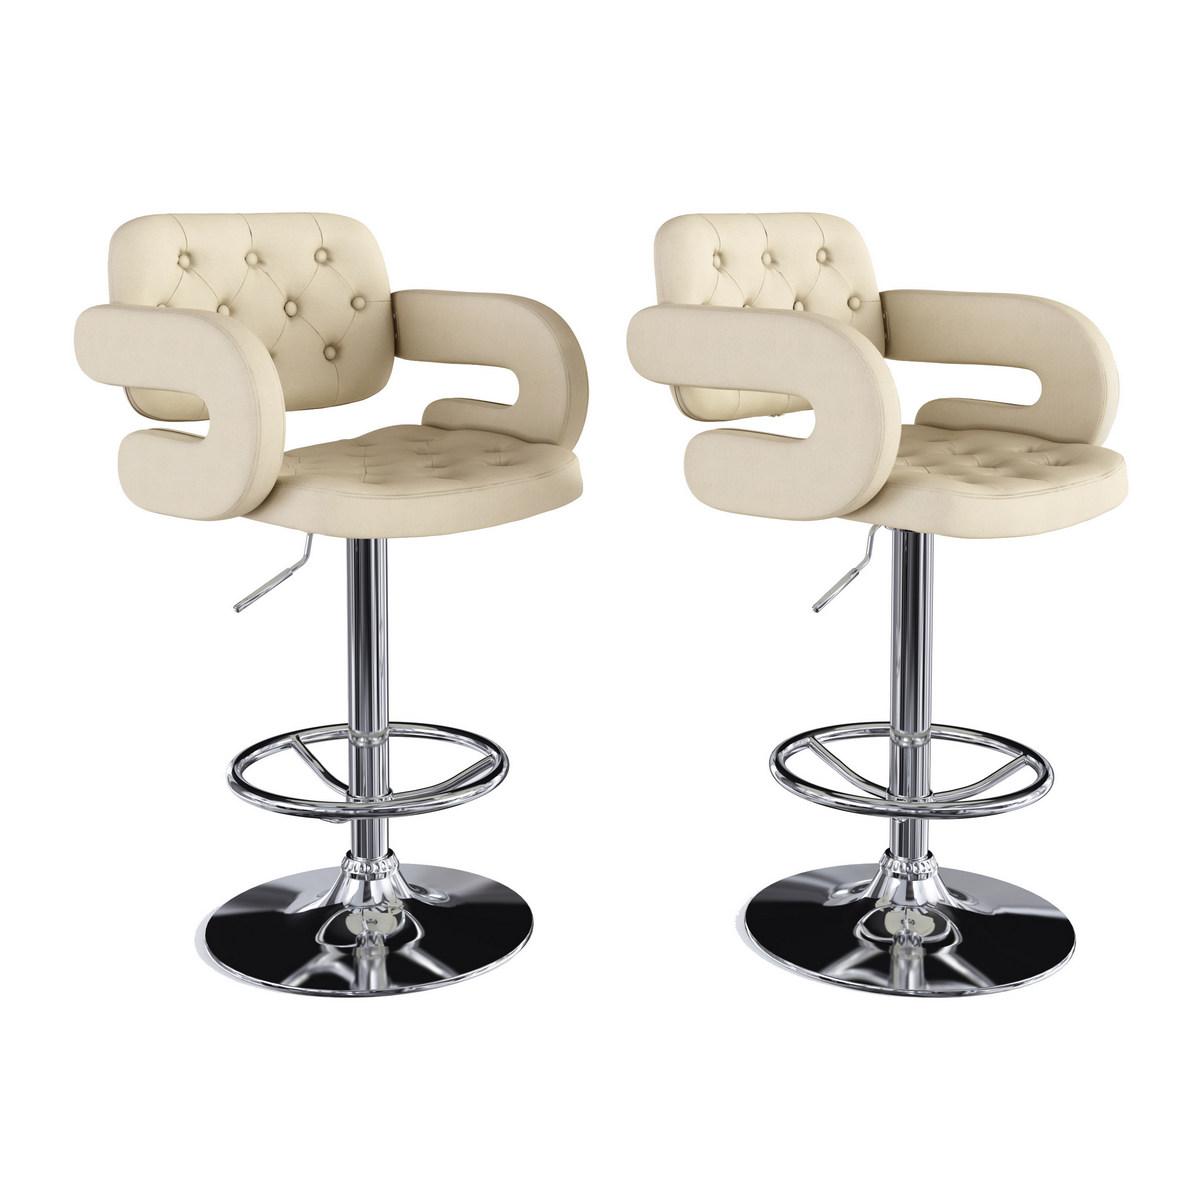 CorLiving DAB-221-B Adjustable Tufted Oatmeal Fabric Barstool w/ Armrests, set of 2